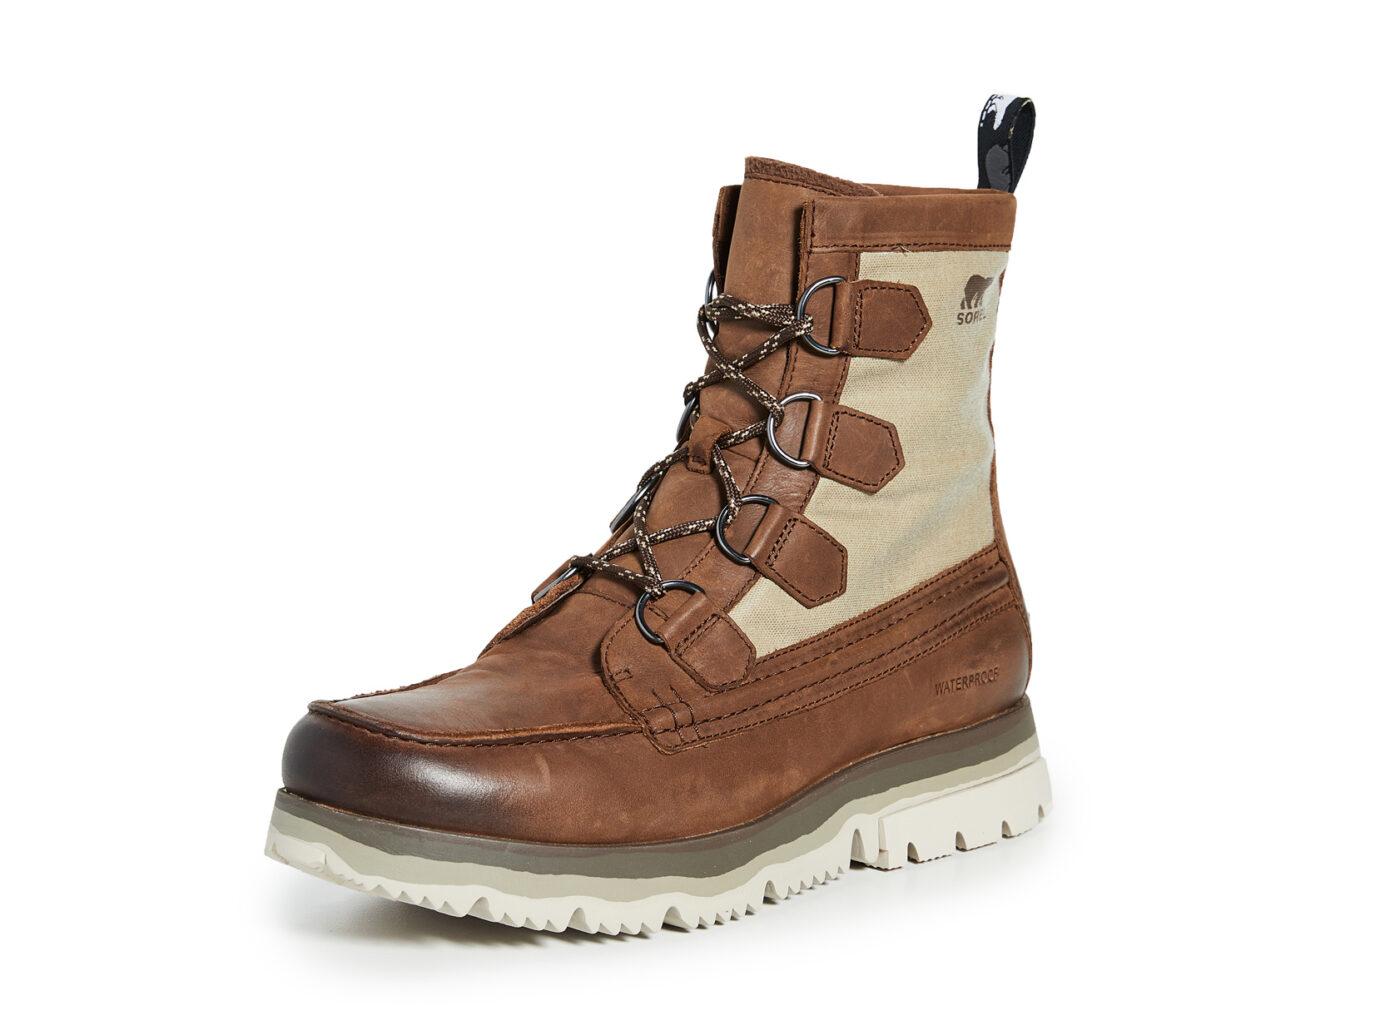 Atlis Caribou Waterproof Boots